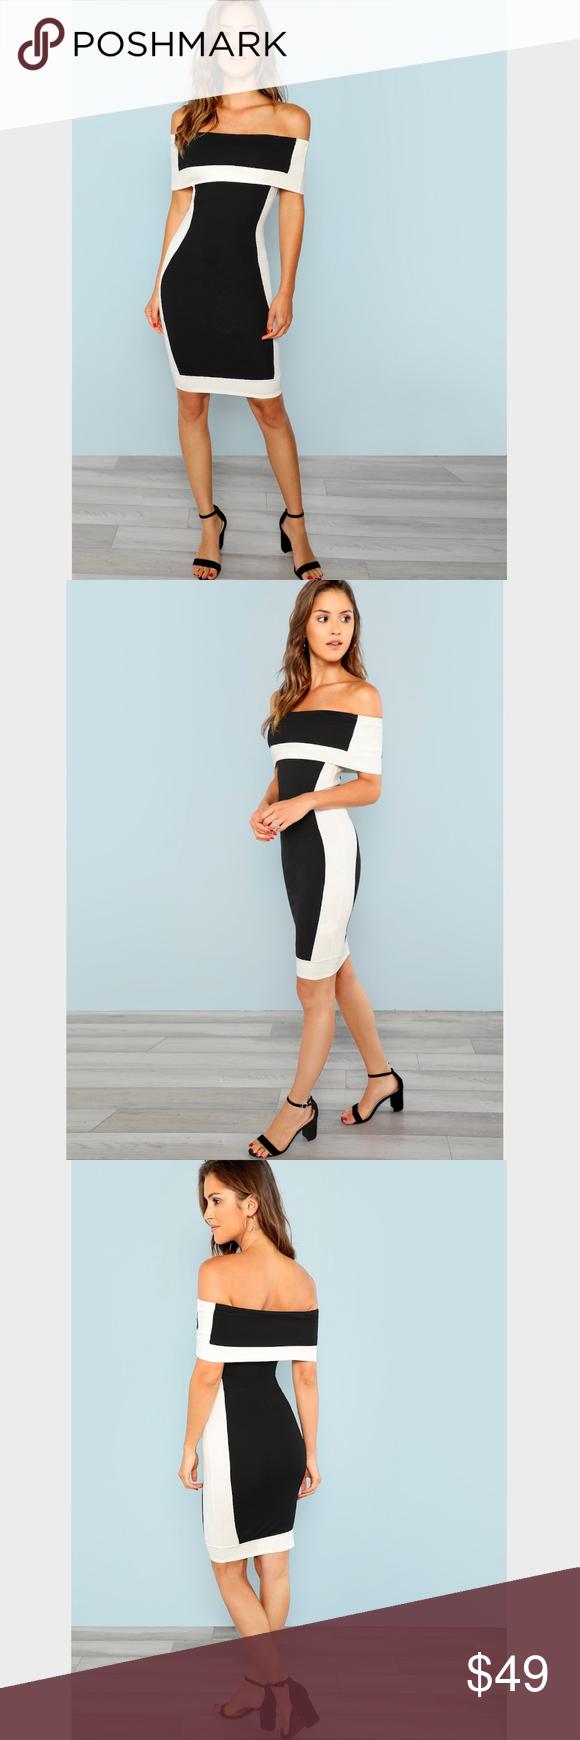 Color Block Off Shoulder Bodycon Contour Dress Party Outfit College Dress Party Night Wedding Guest Dress Summer [ 1740 x 580 Pixel ]